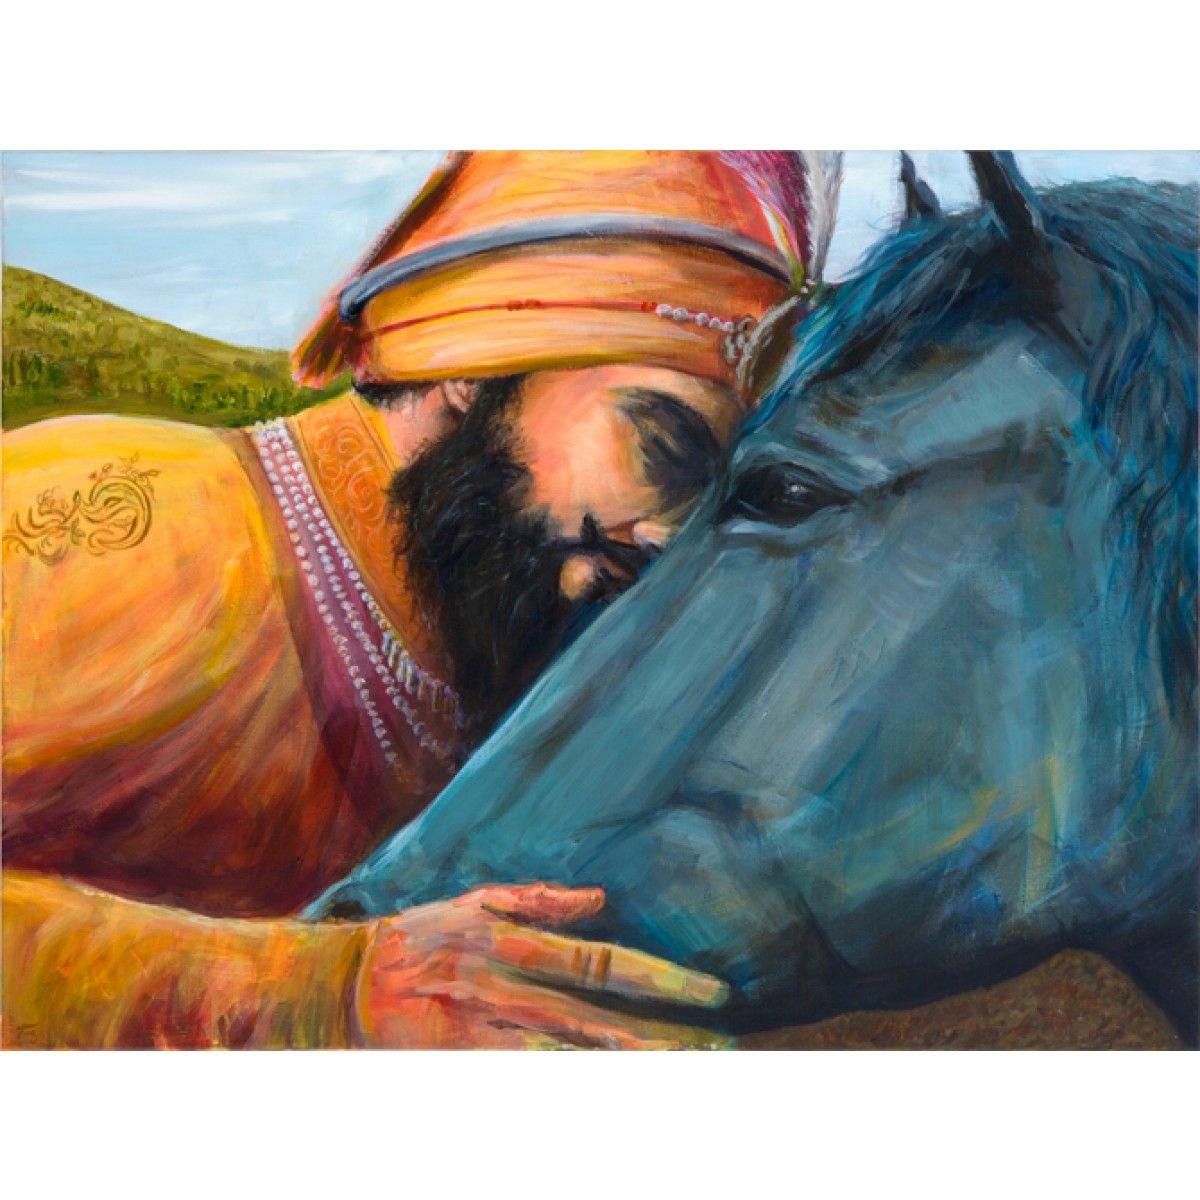 Beautiful Sikh Art of Guru Gobind Singh Ji with his ...